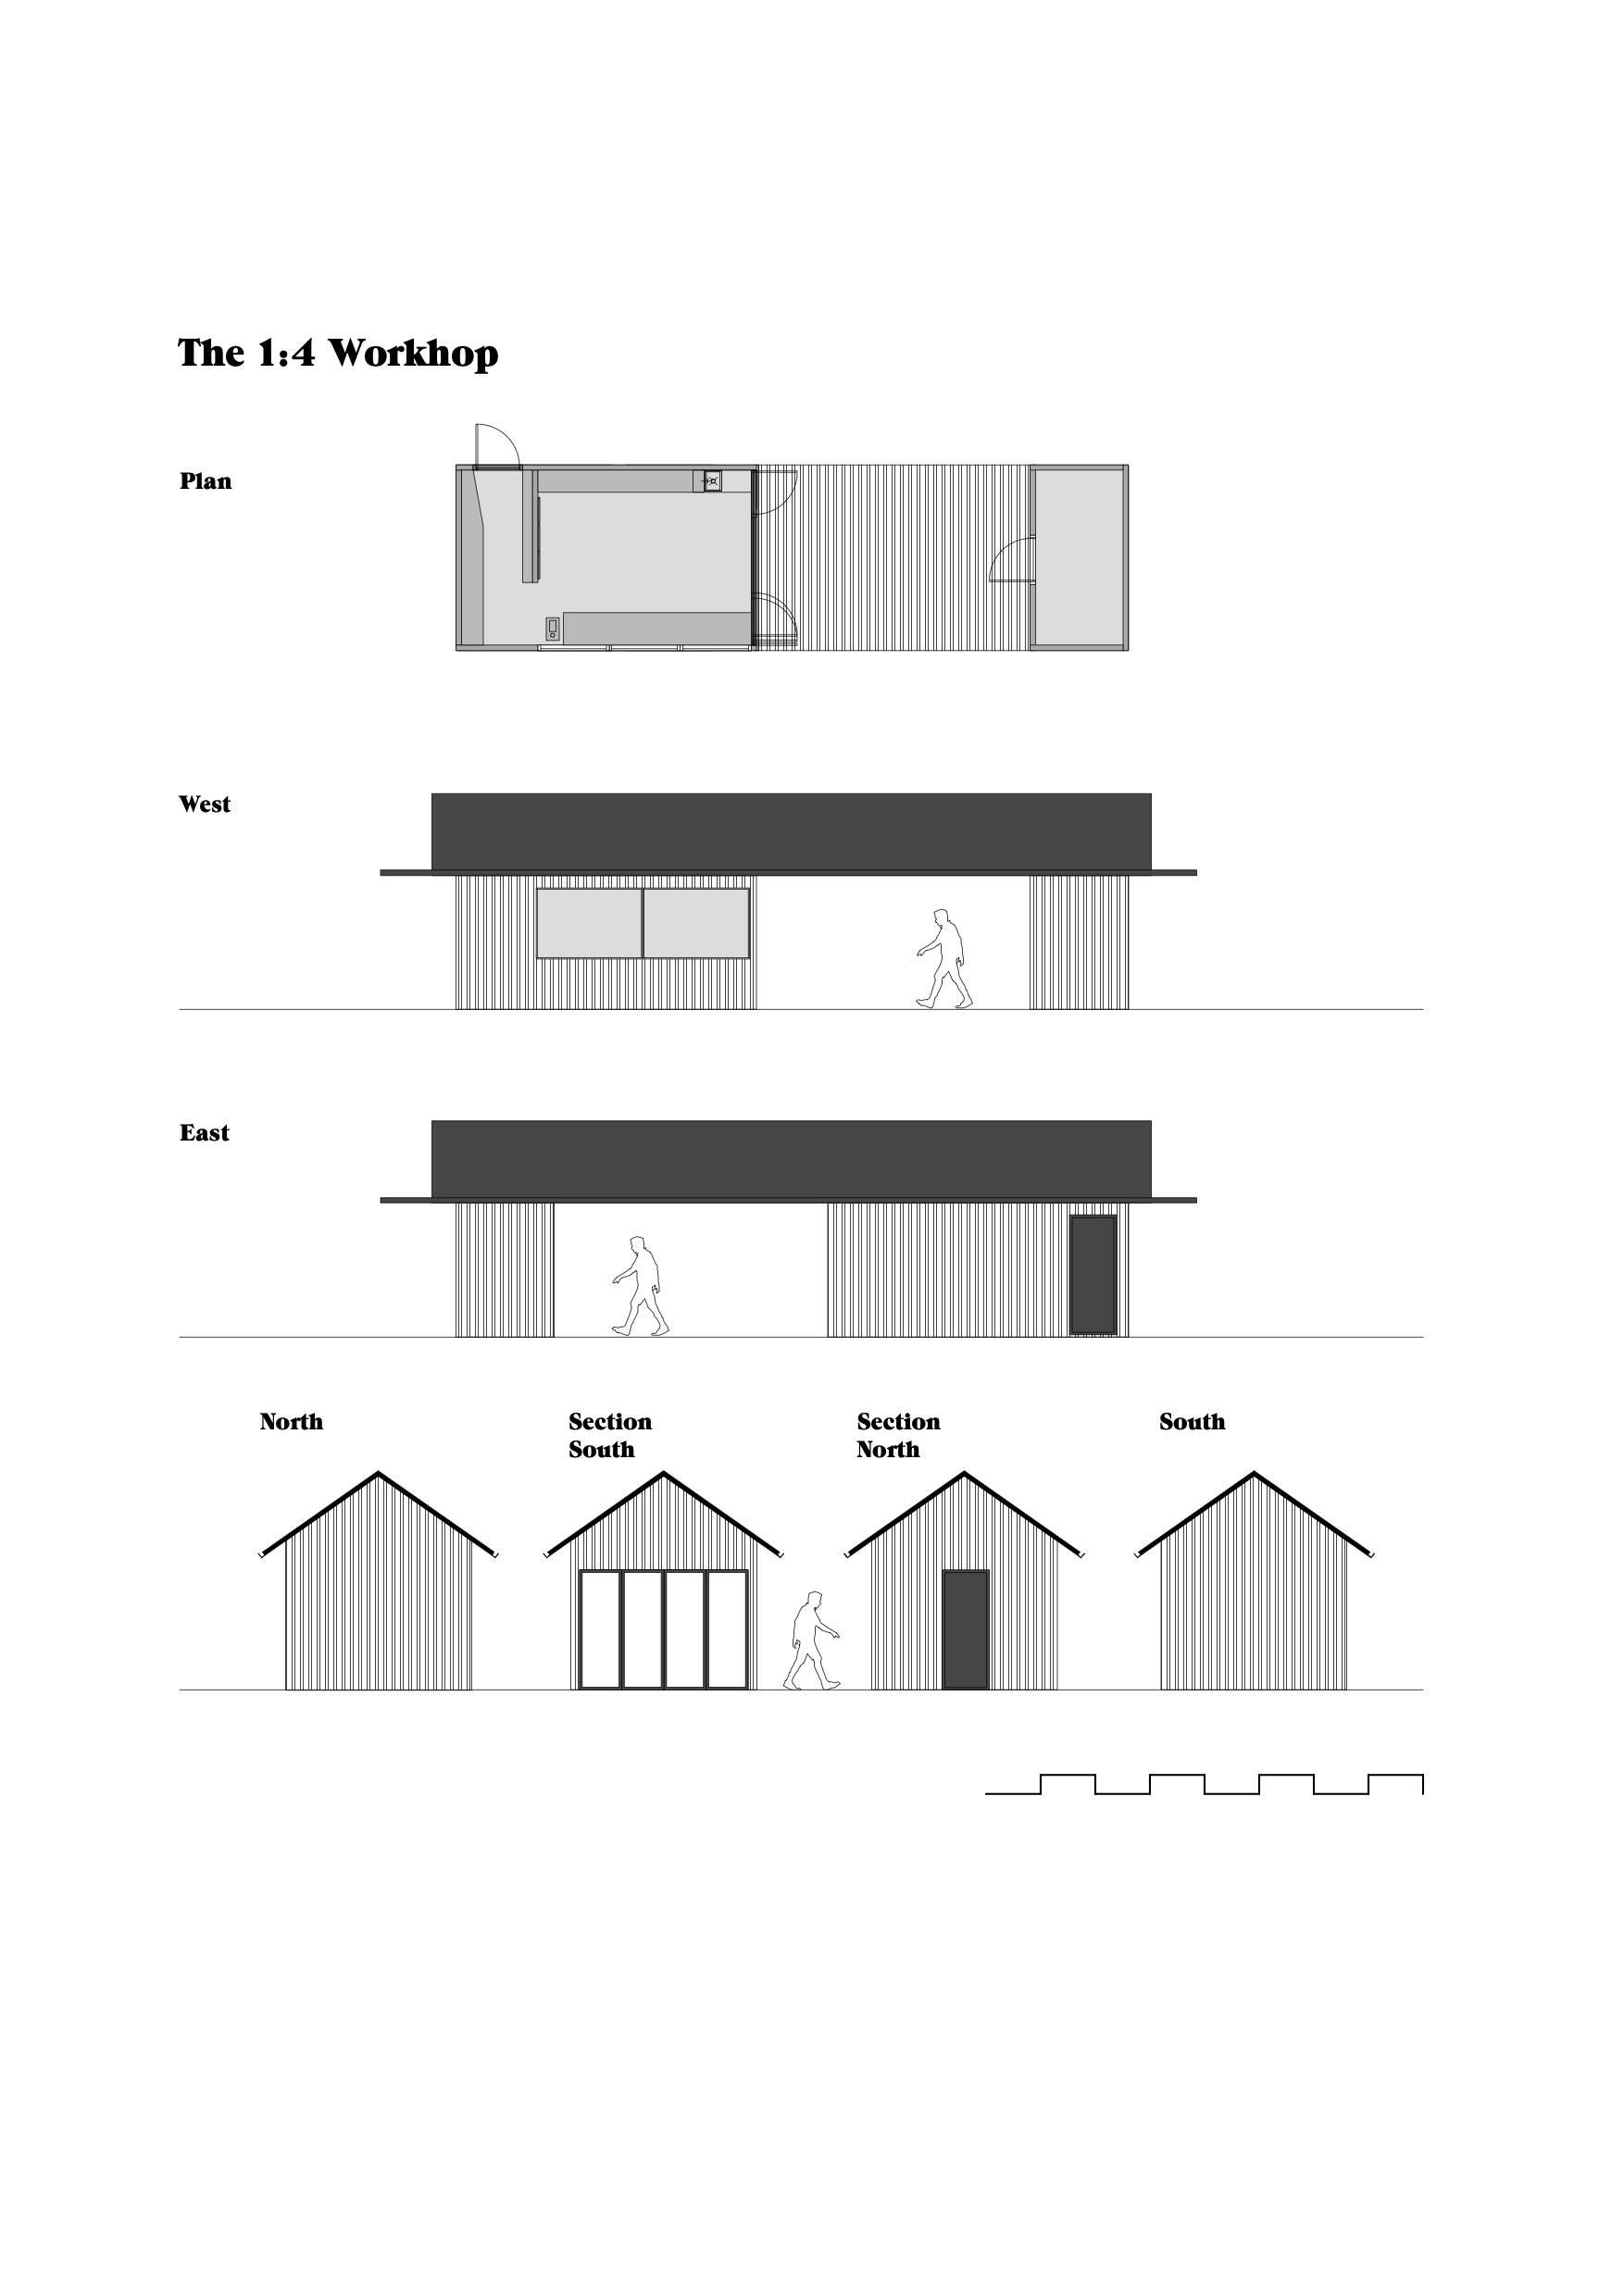 Workshop plan